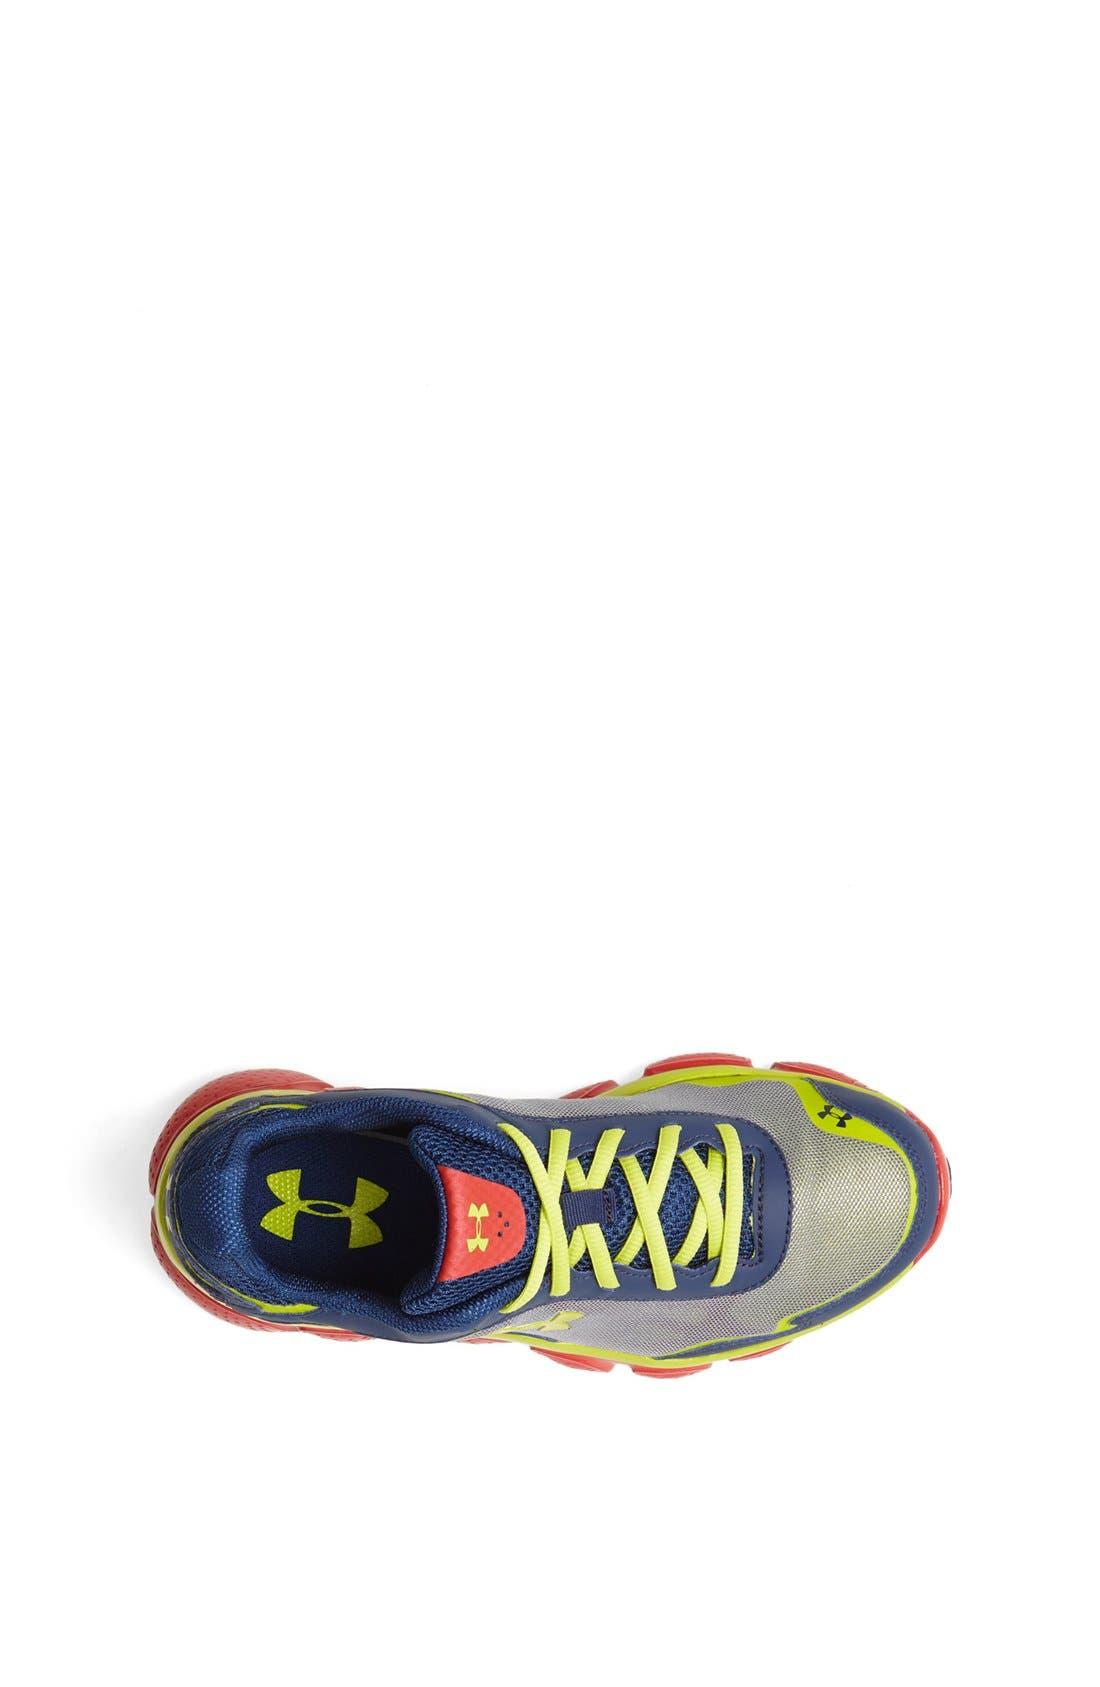 Alternate Image 3  - Under Armour 'Micro G® Pulse' Training Shoe (Toddler, Little Kid & Big Kid)